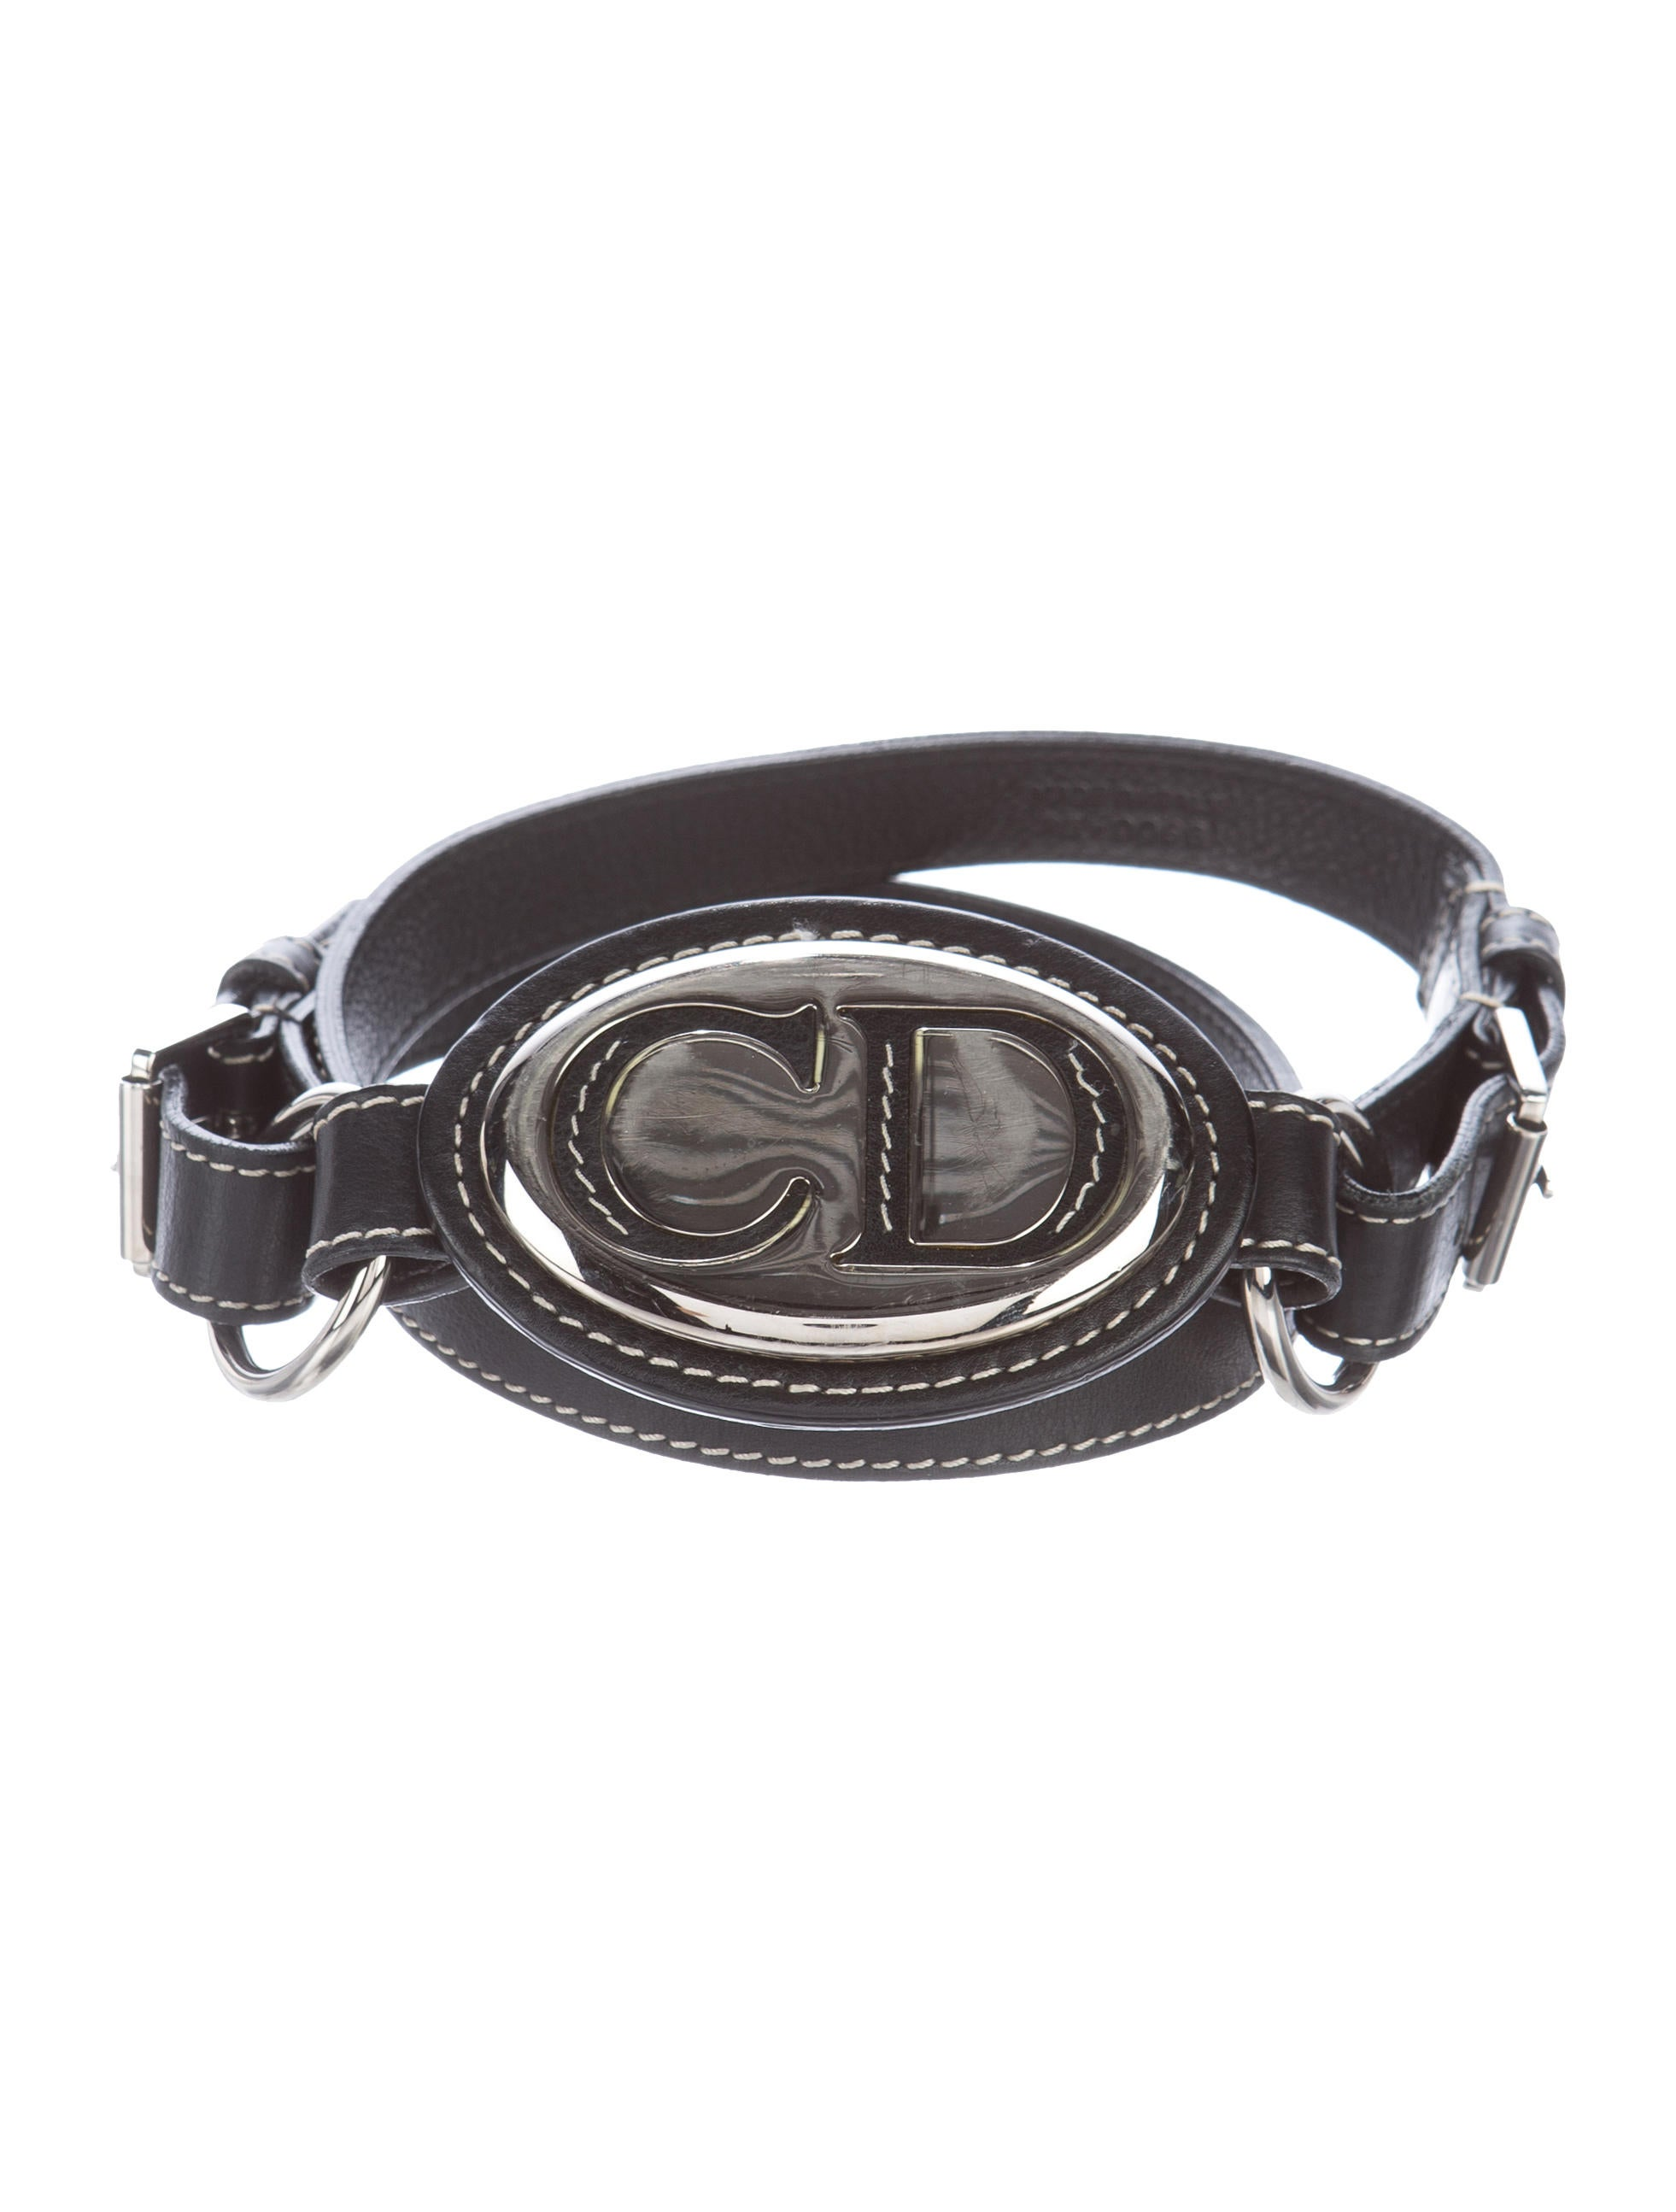 68dfef813ab Christian Dior Ladies Belt